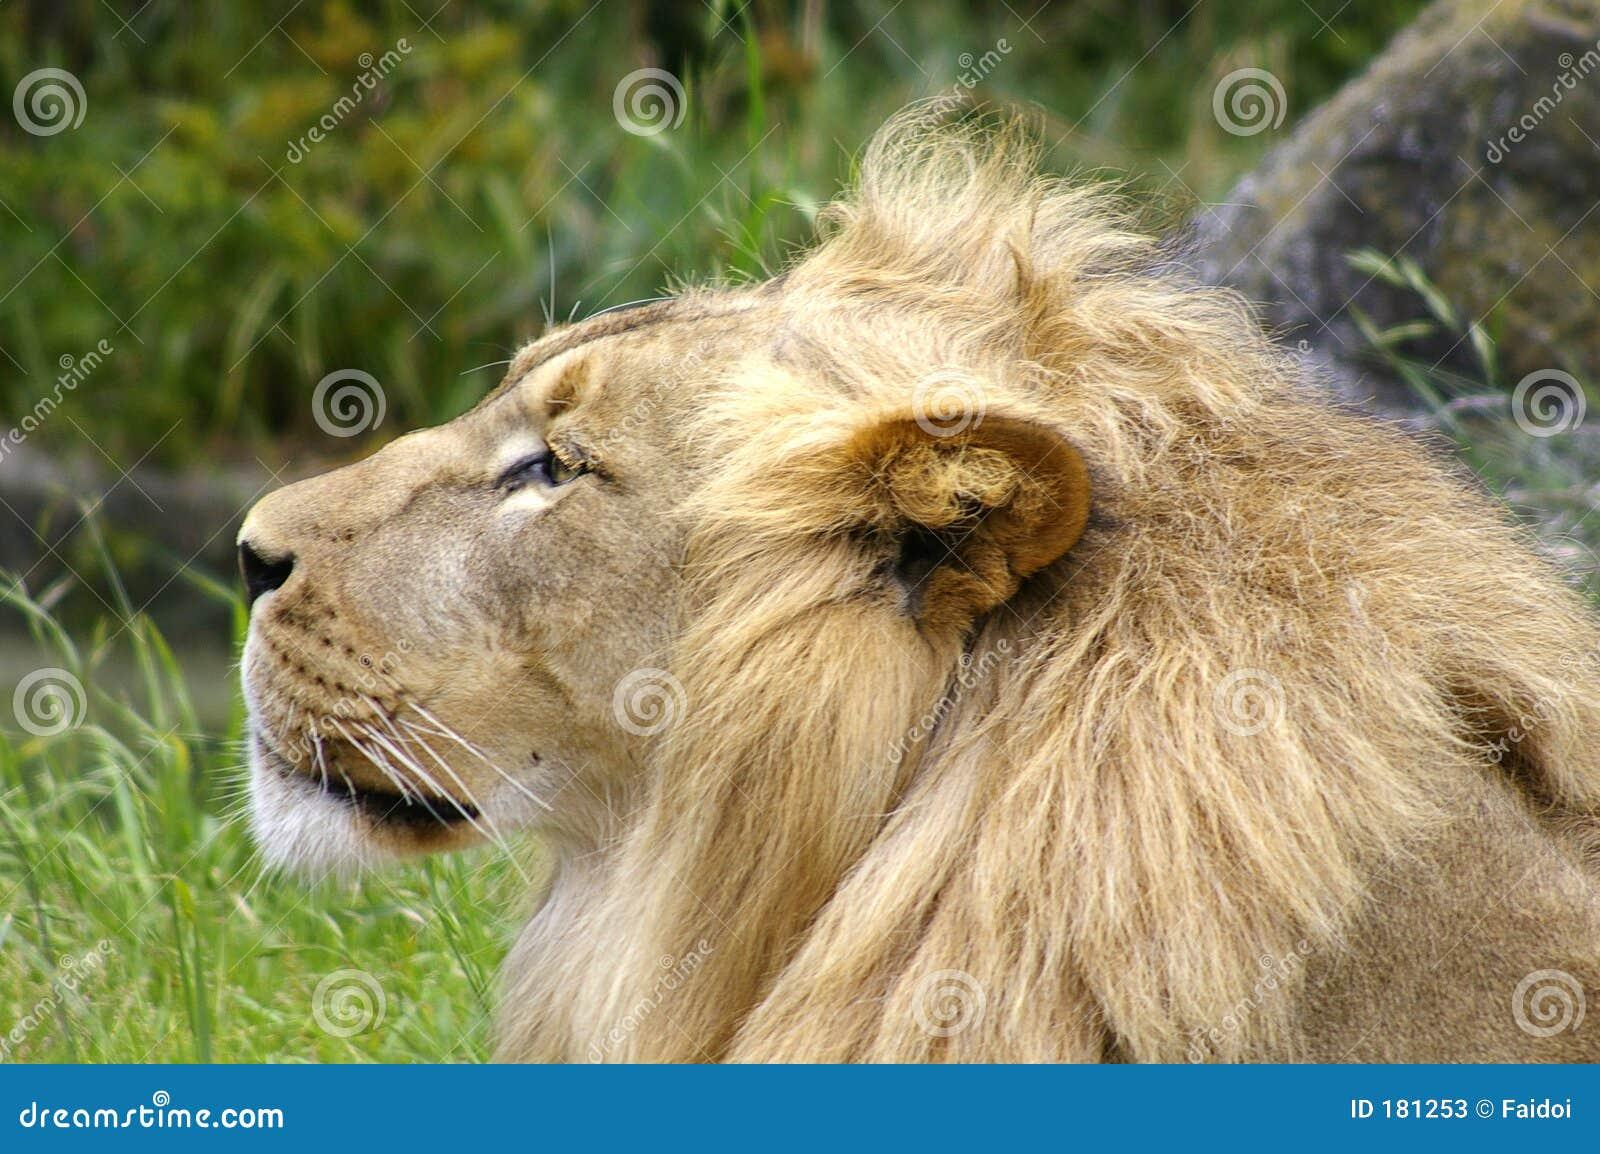 Lion Profile Stock Photos - Image: 181253